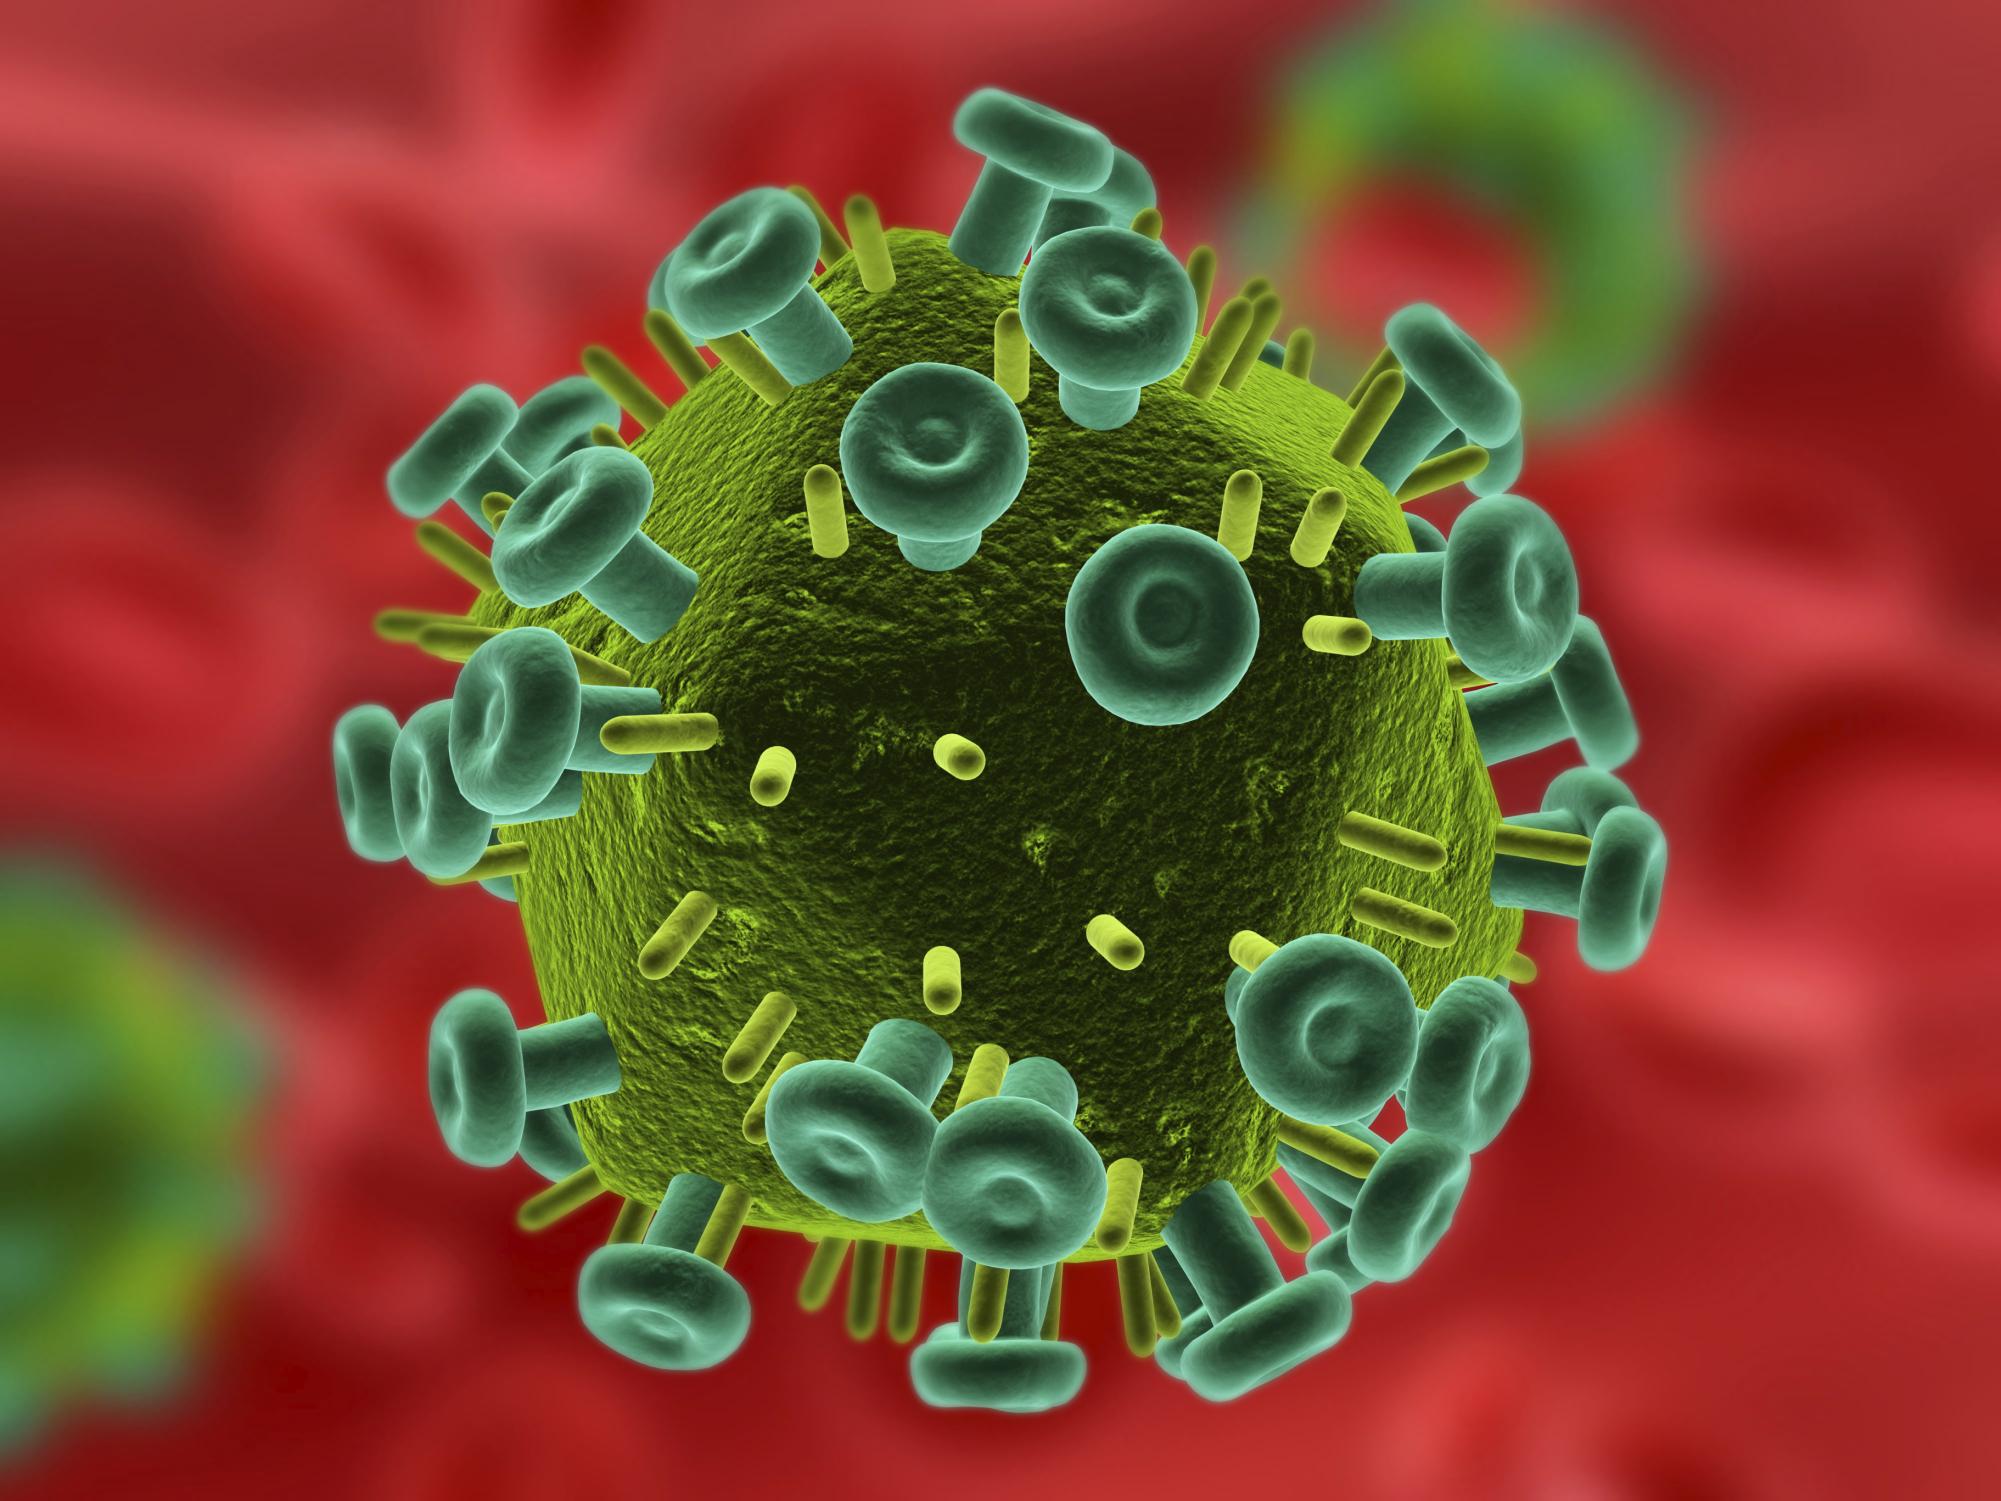 Картинка вируса спида и все о ней